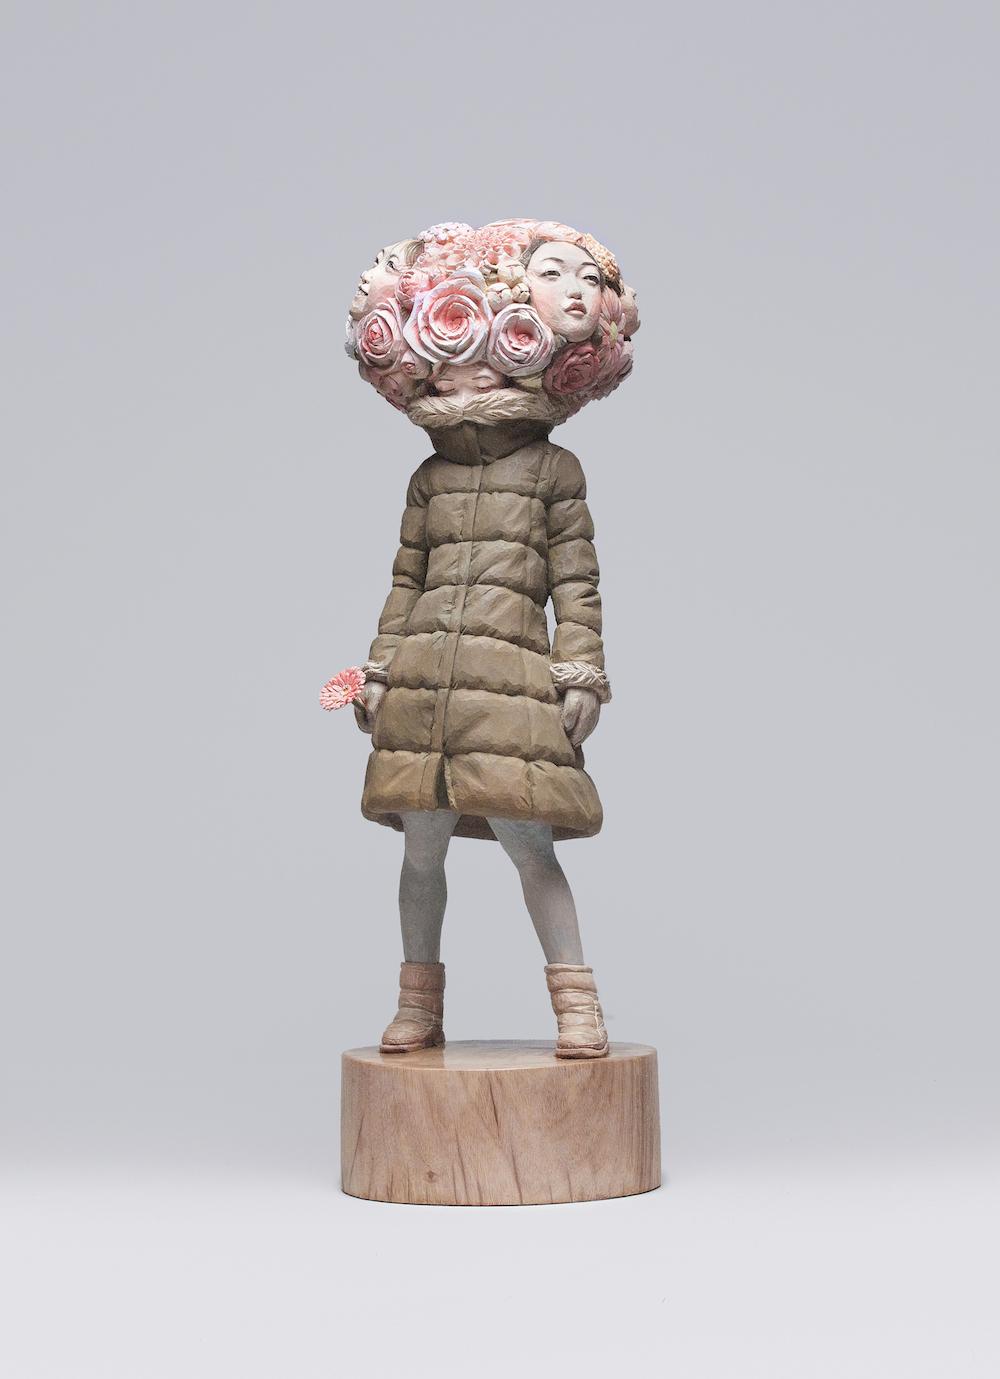 FUMA Contemporary Tokyo | 文京アート 金巻芳俊 春巡ヴァニタス 2016年 楠 62×20×20 cm